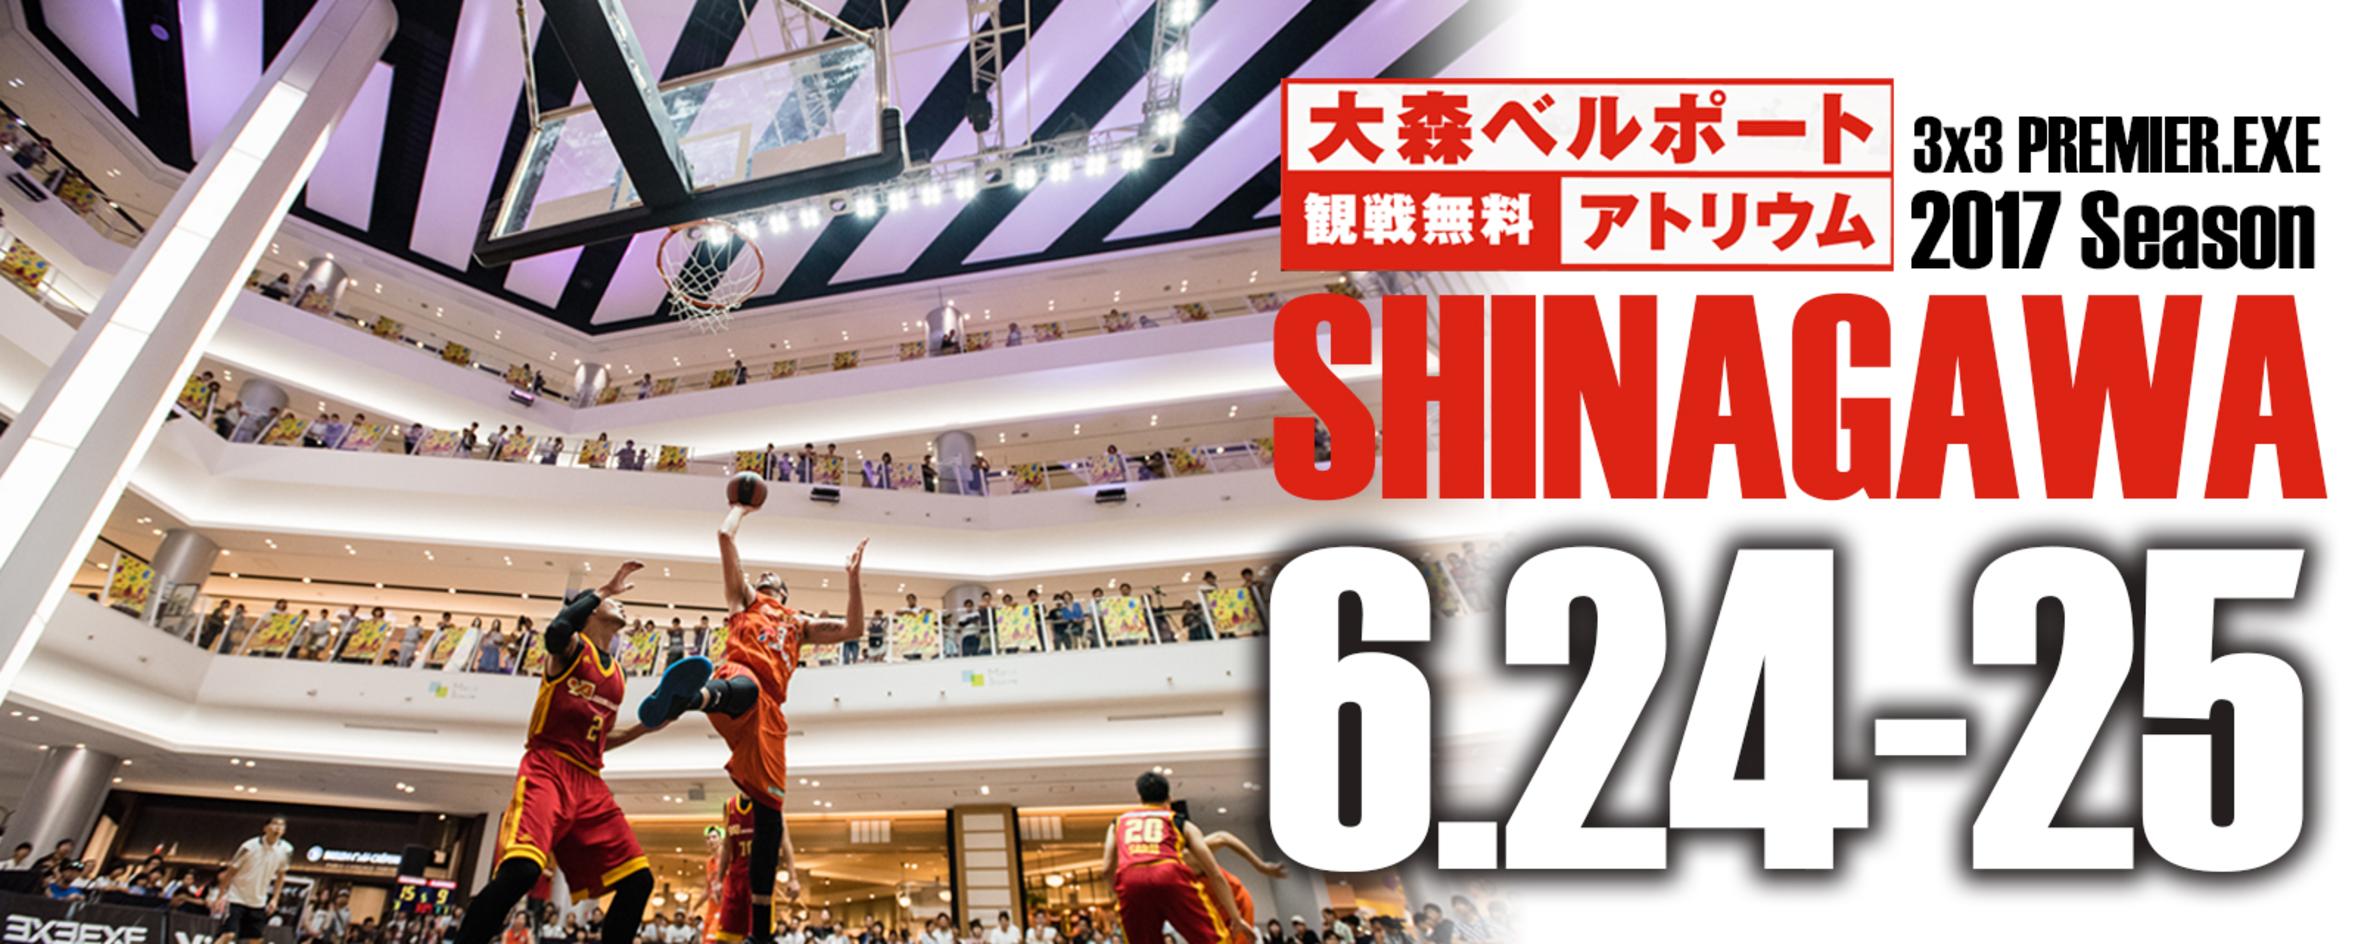 3x3 PREMIER.EXE 2017 SHINAGAWA